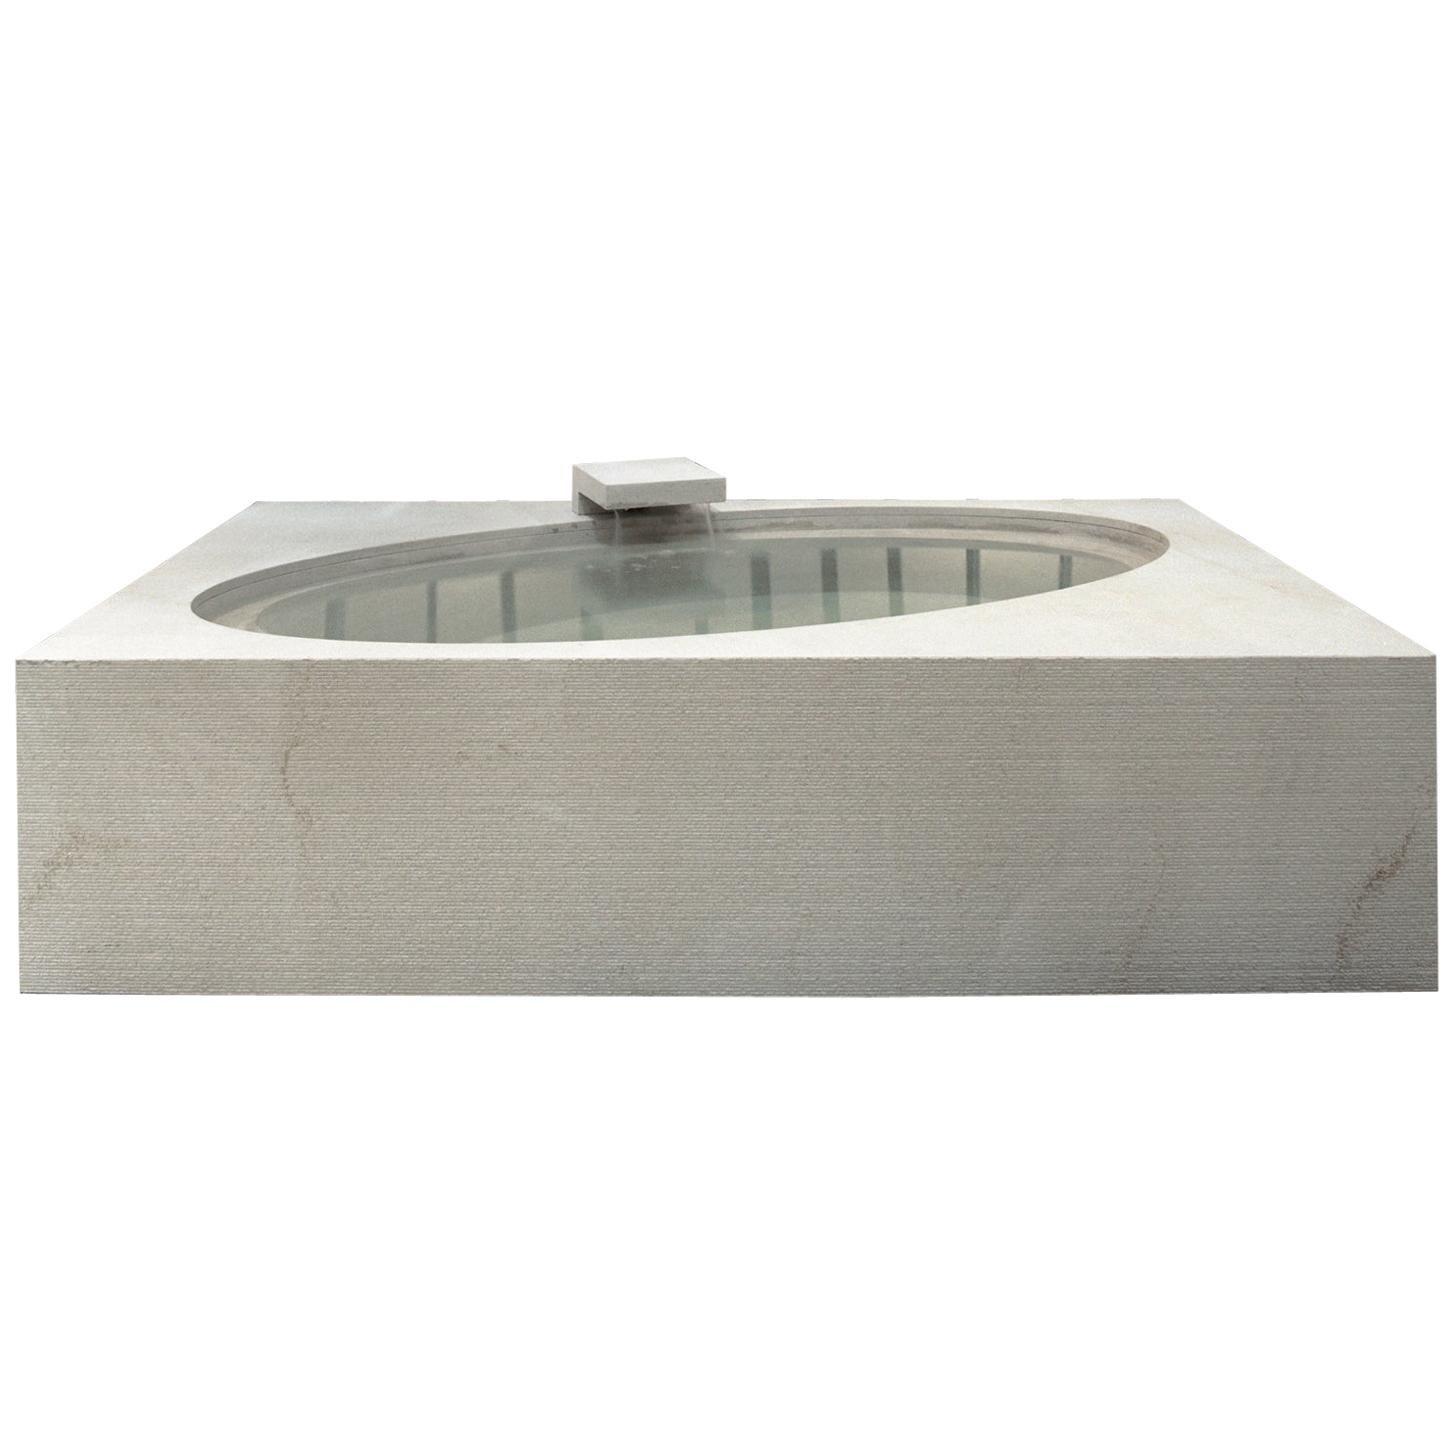 """Wabi"" Caved Bathtub Made of Stone Customizable"